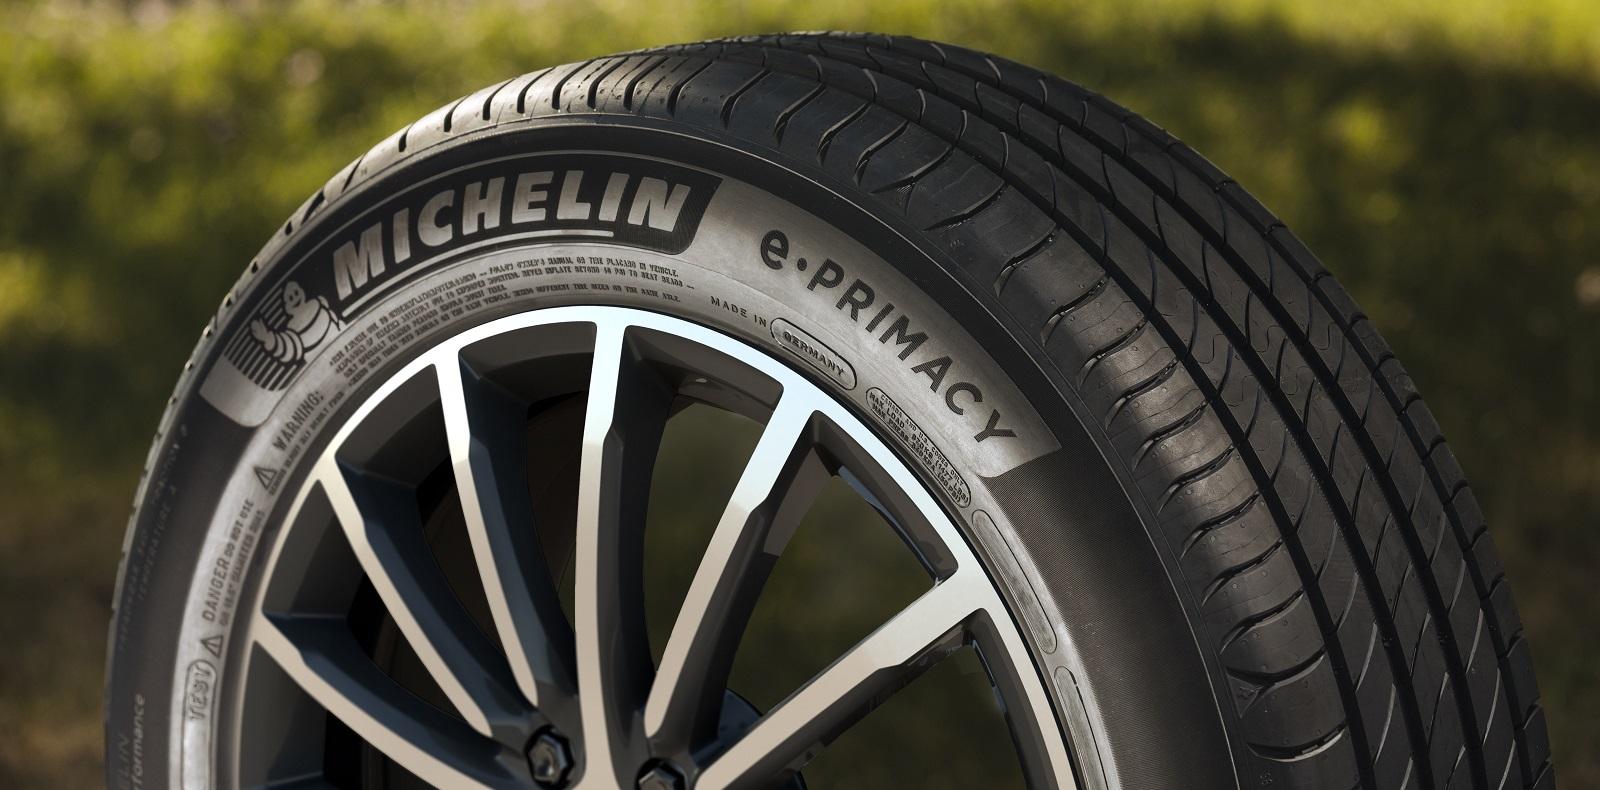 Michelin e.Primacy tyres